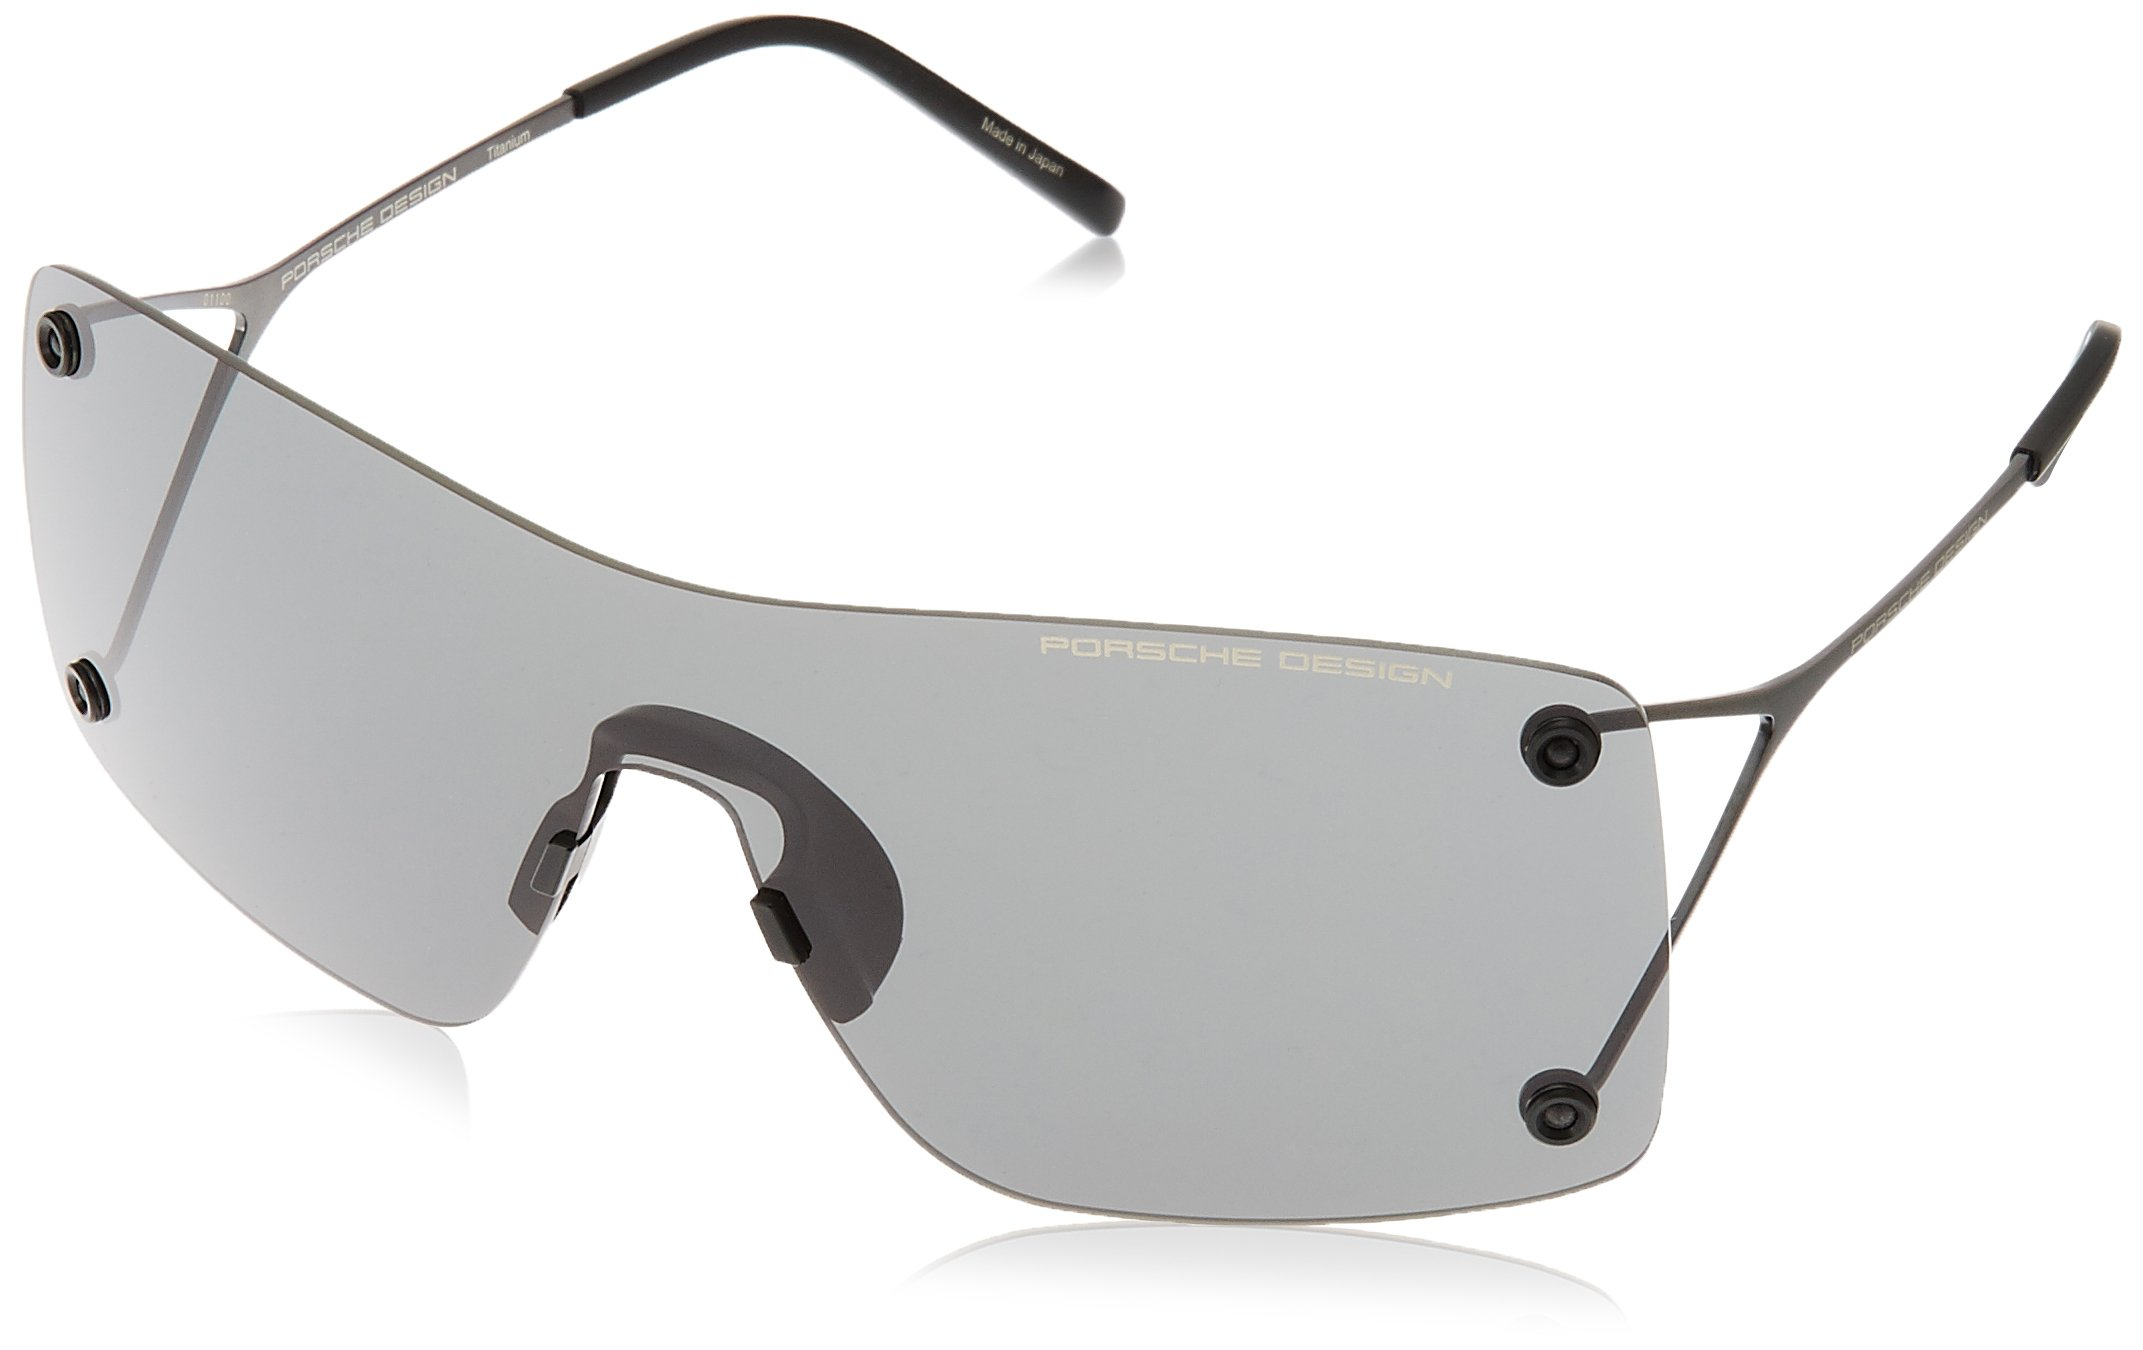 Homme C Montures Porsche De LunettesNoirschwarz99 1 0 Sonnenbrille 99 Design P8620 145 8nwXNP0Ok